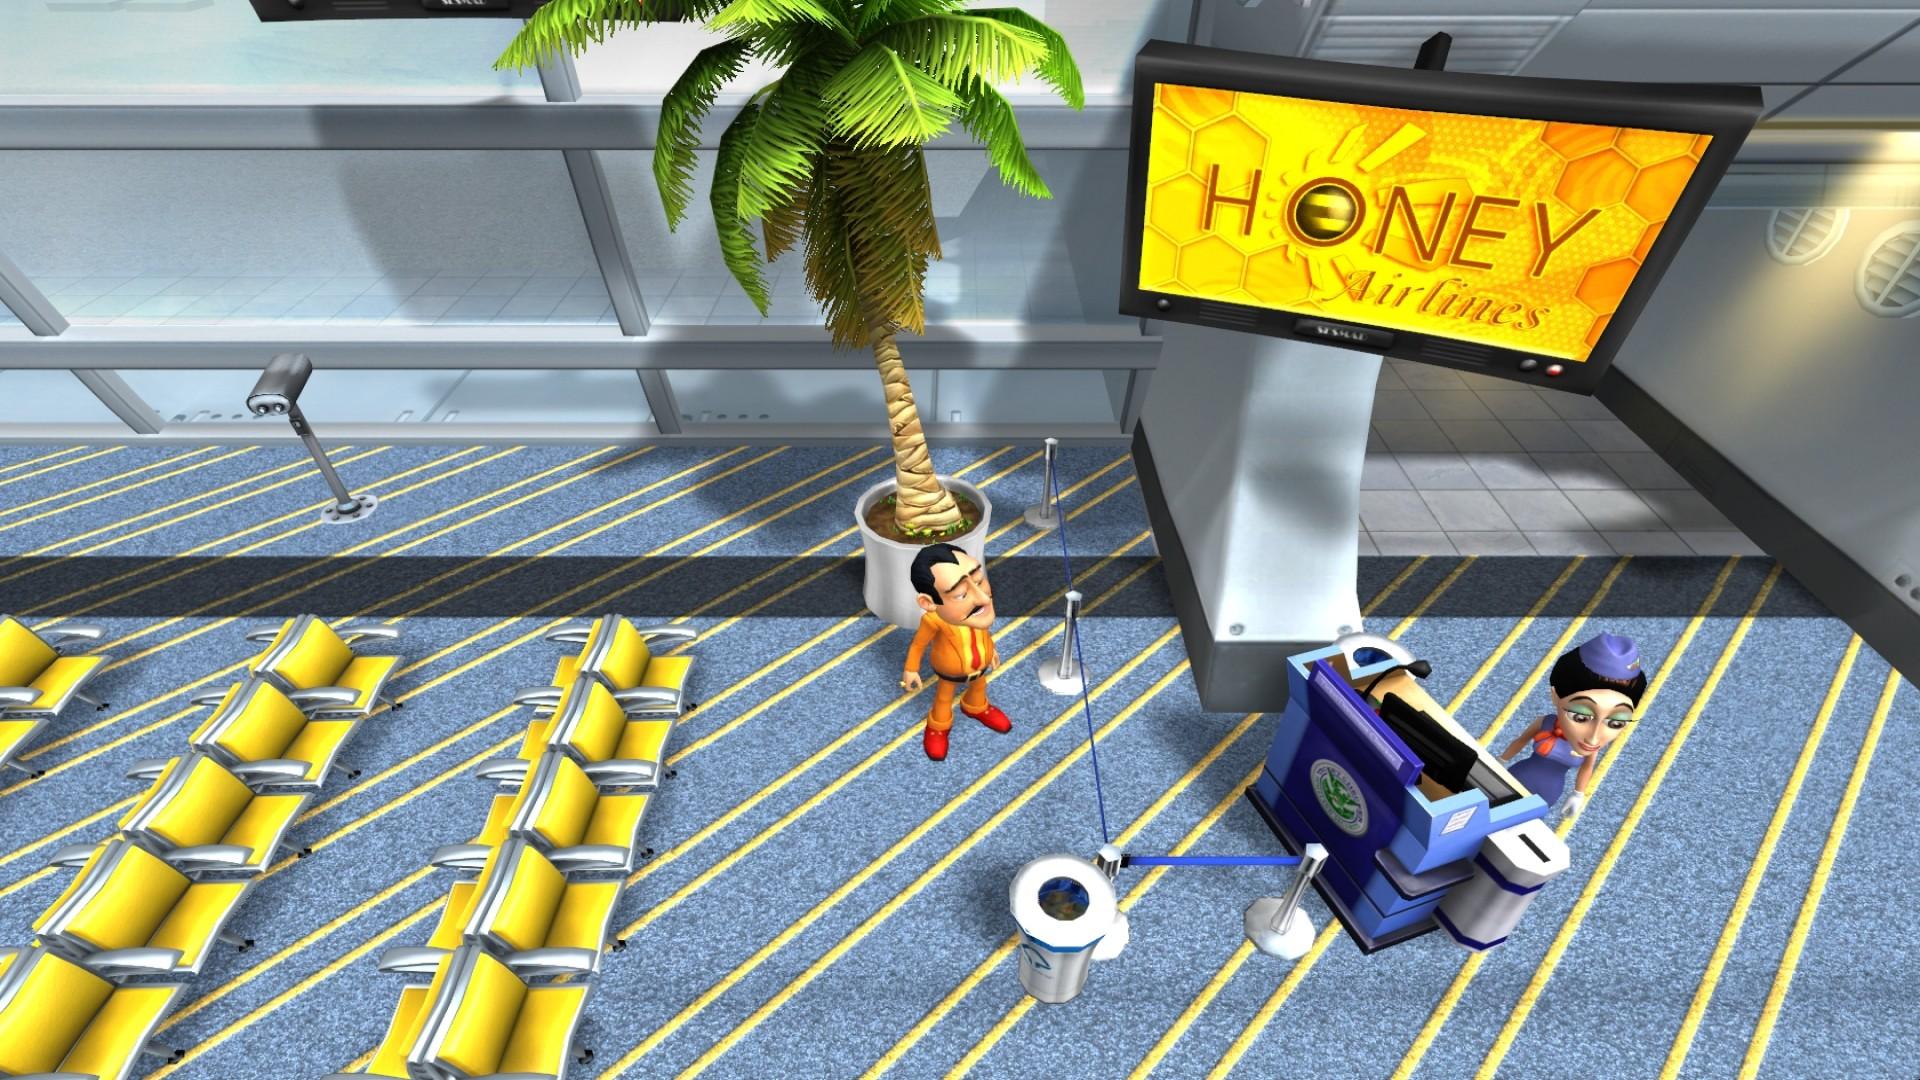 Airline Tycoon 2: Honey Airlines DLC screenshot